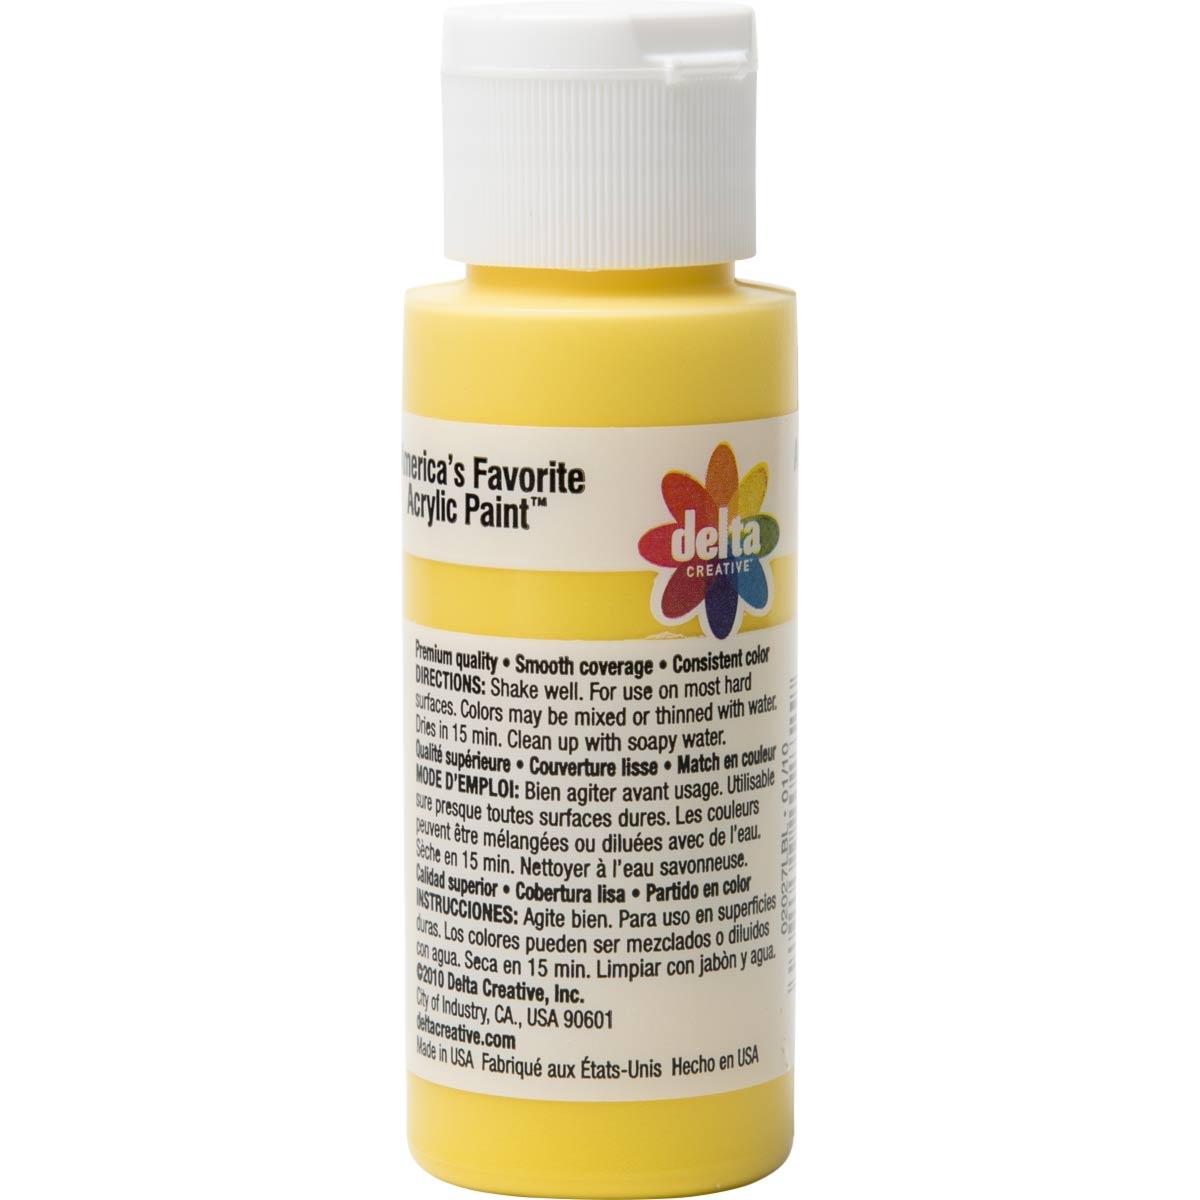 Delta Ceramcoat ® Acrylic Paint - Bright Yellow, 2 oz.